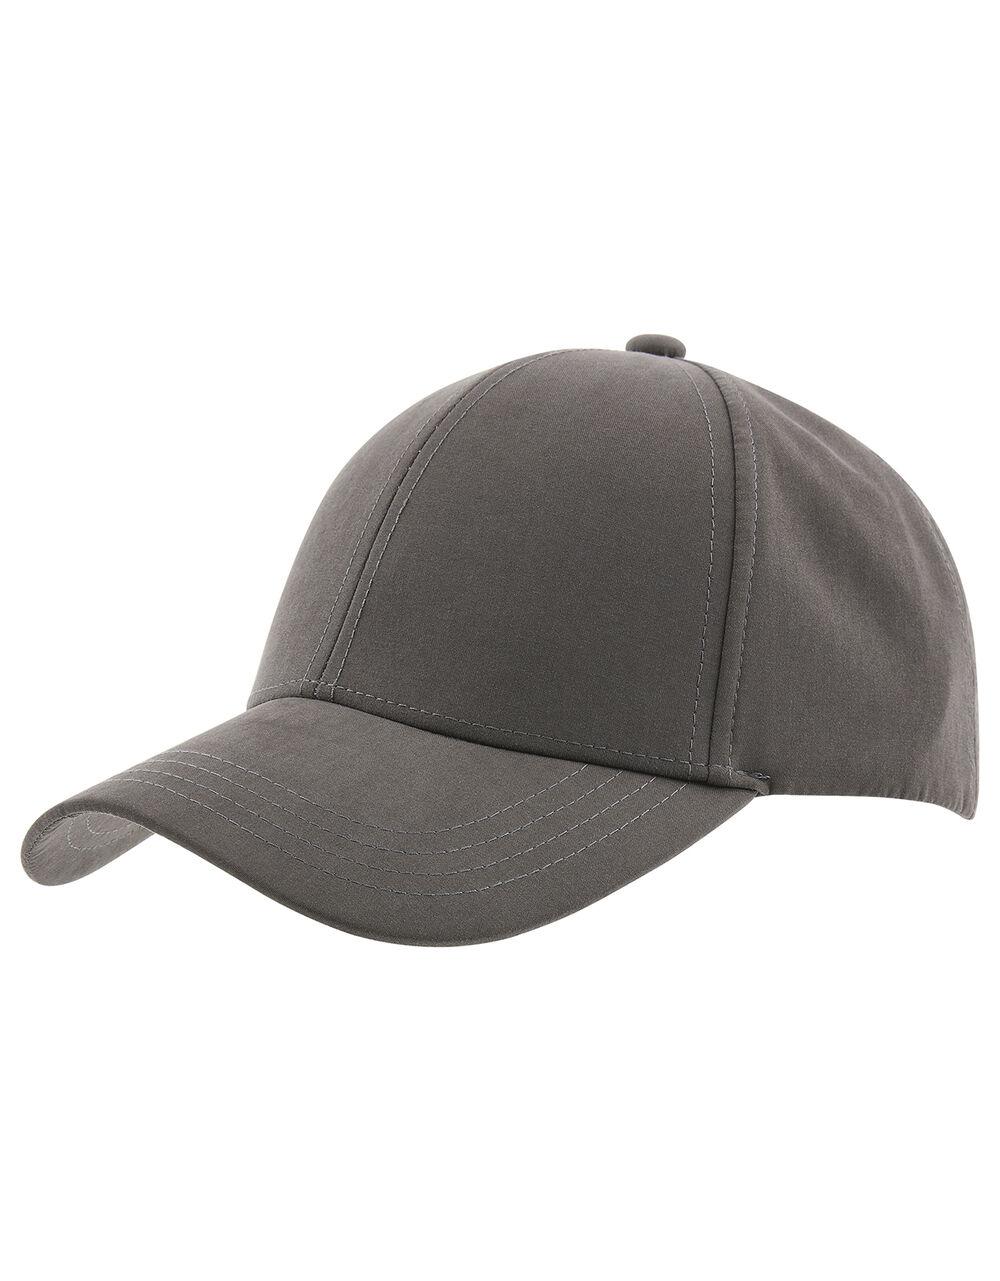 Jamie Plain Baseball Cap, Grey (GREY), large